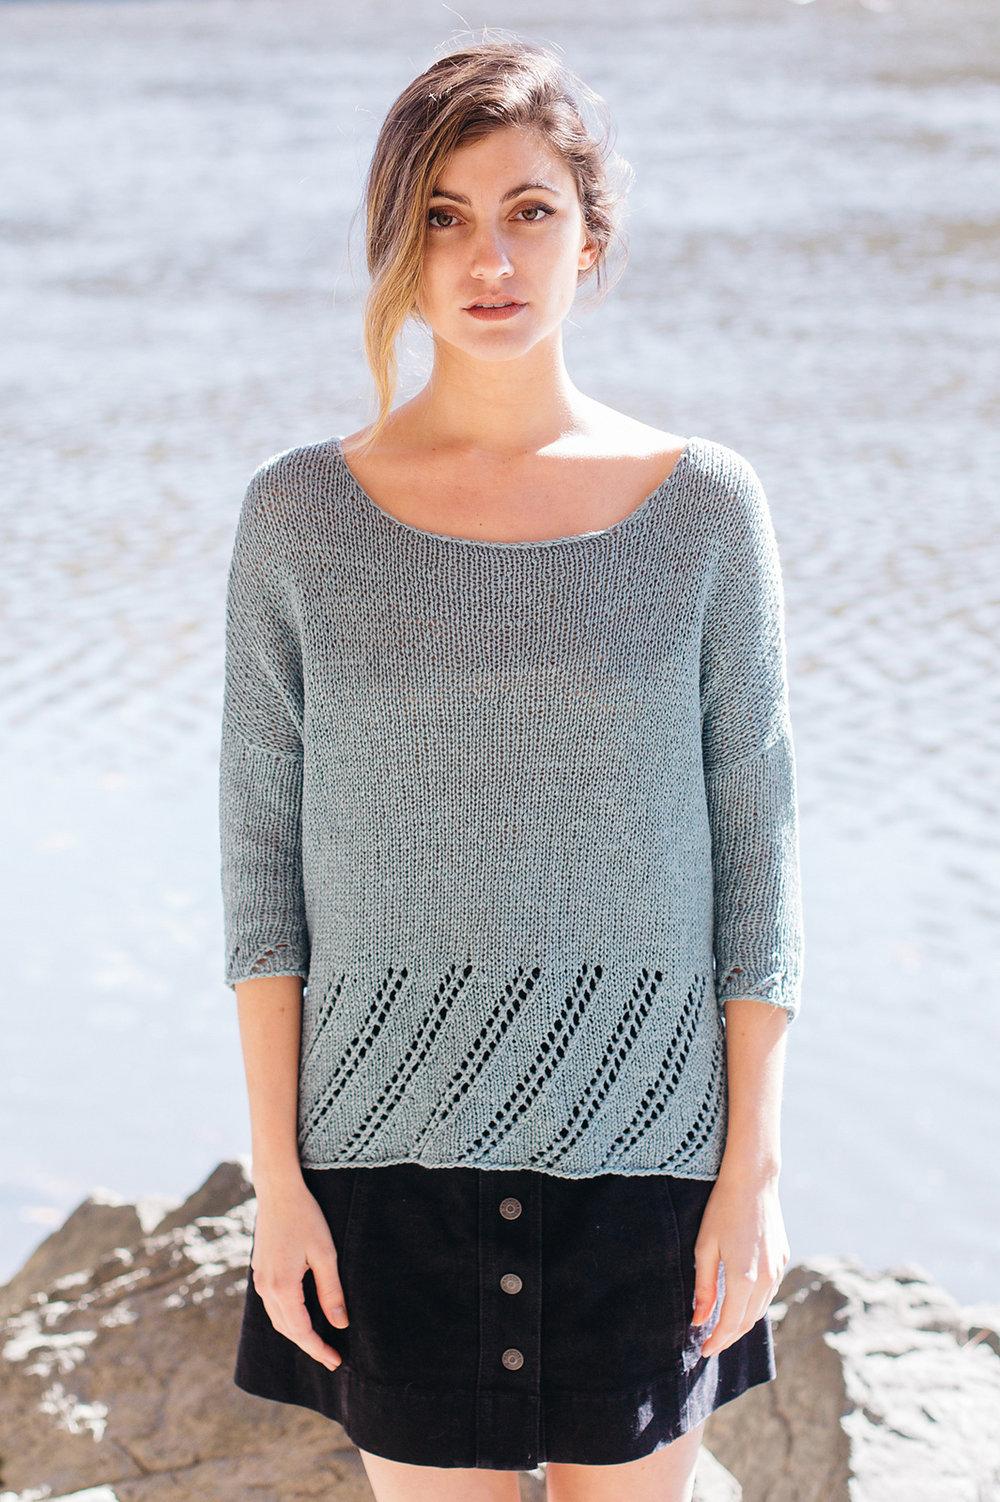 quince-and-co-laguna-elizabeth-smith-knitting-pattern-kestrel-1.jpg